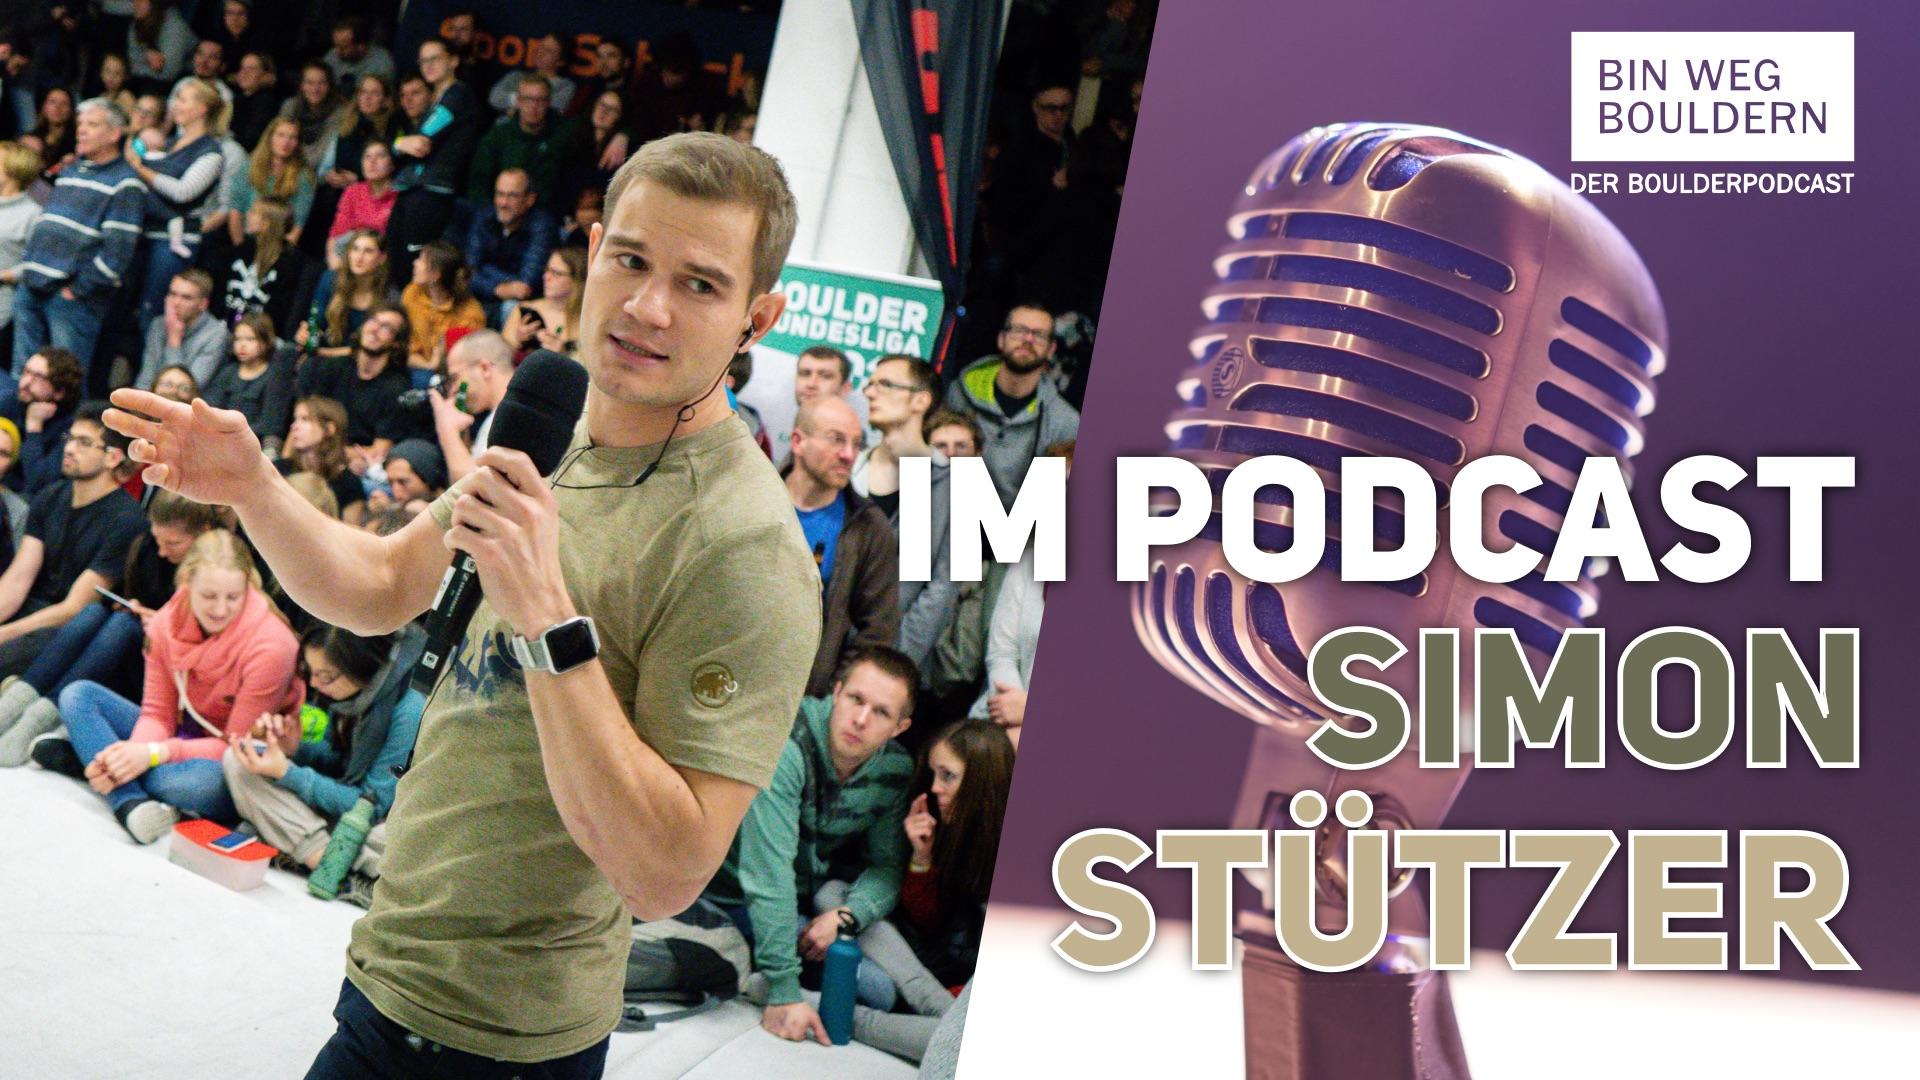 Podcast: Simon Stützer über die Boulder Bundesliga